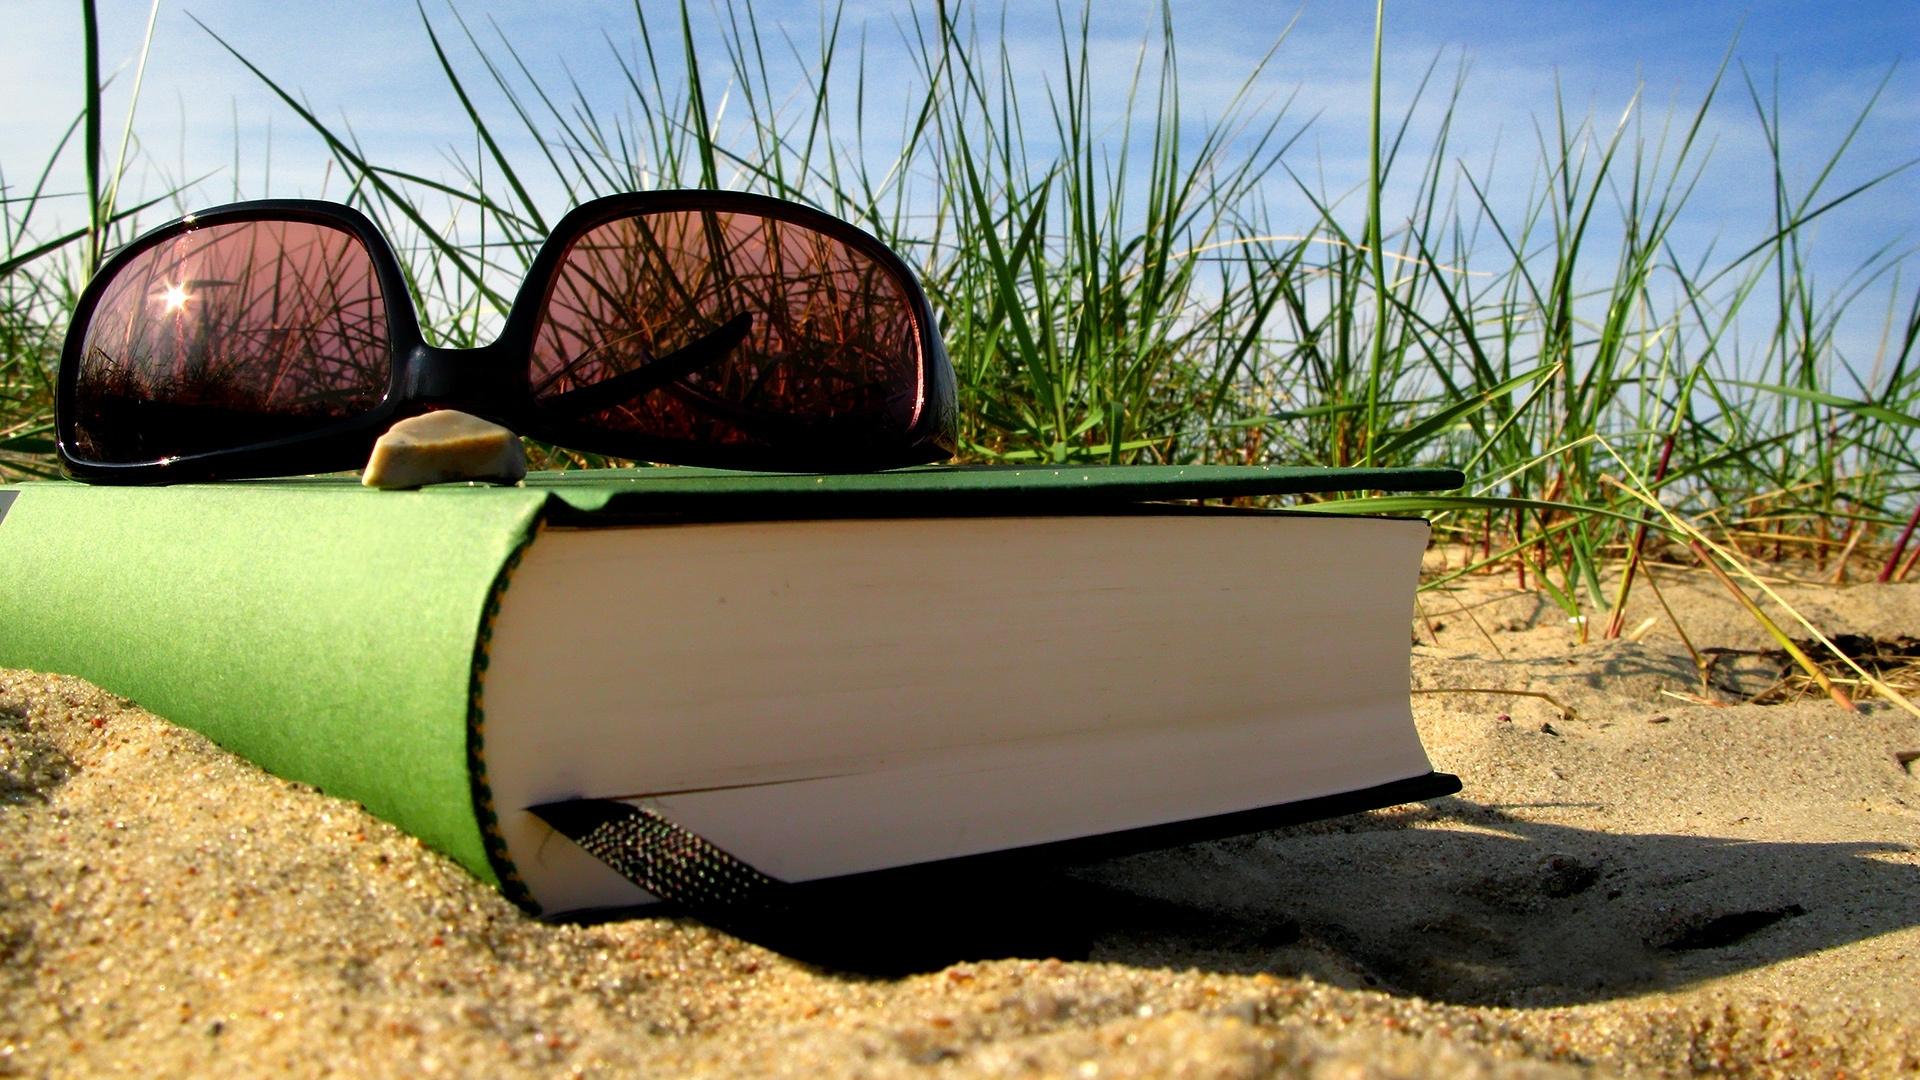 original-summer-vacation-book-glasses-bookmark-sand.jpg